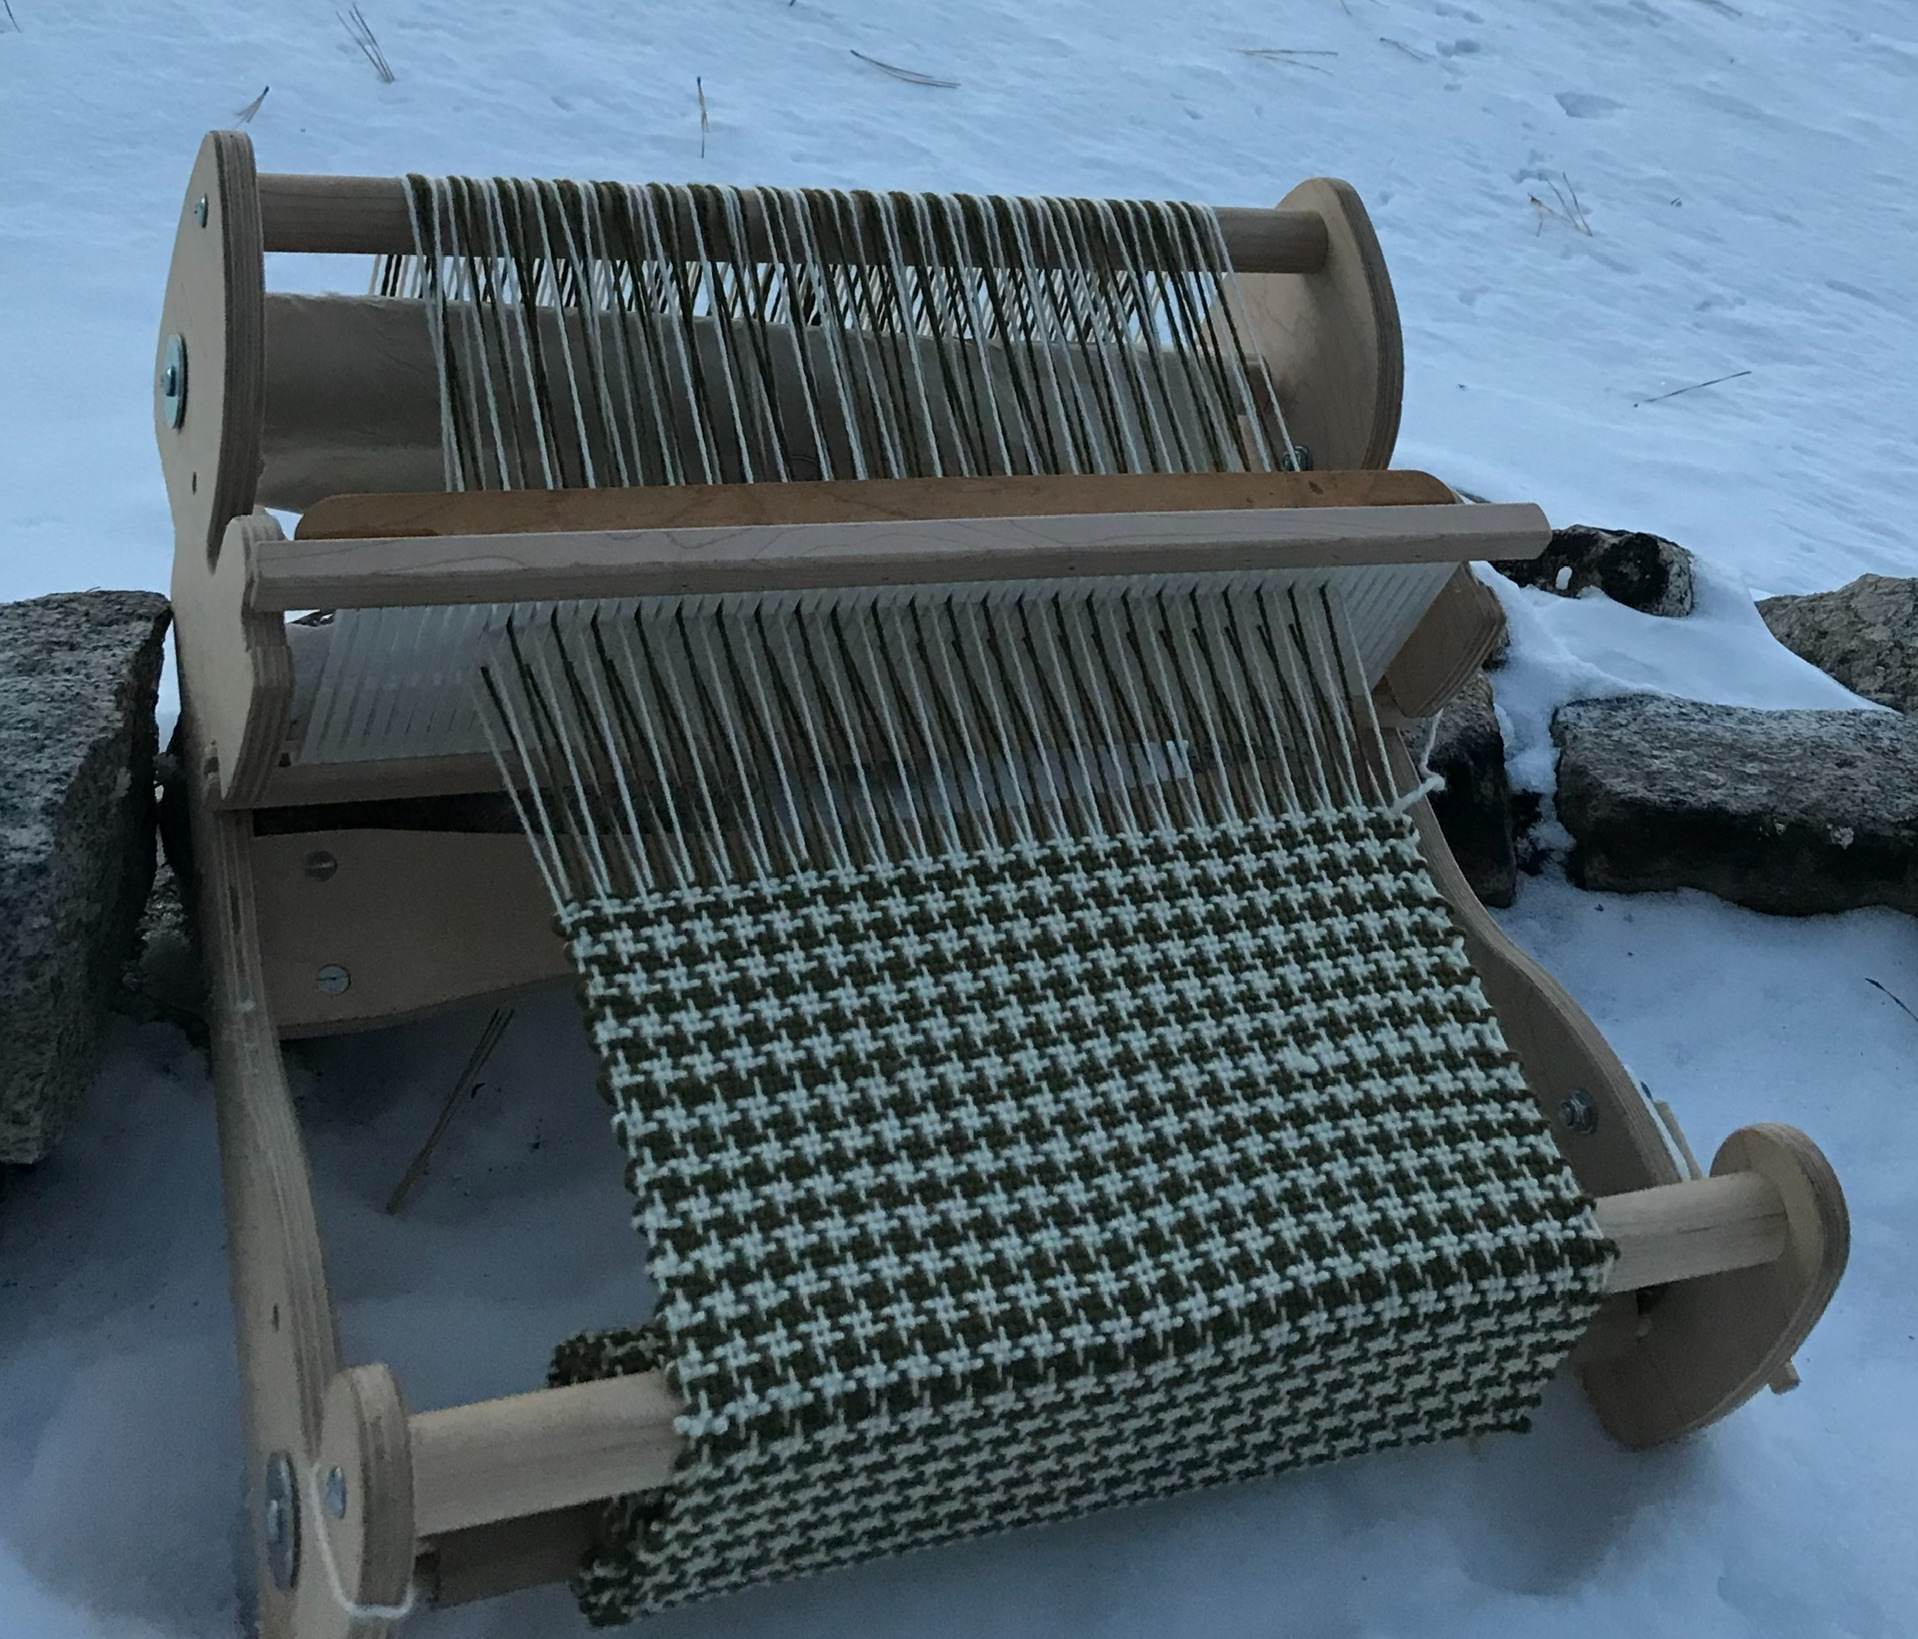 Rigid Heddle Loom Weaving - Instructor: Zwitsa Kachinski of Meraki HandwovenDate: Friday, Sept. 6, 9:00-5:00 (Full Day Class)Cost: $125Maximum 8 spotsNo Experience Needed.